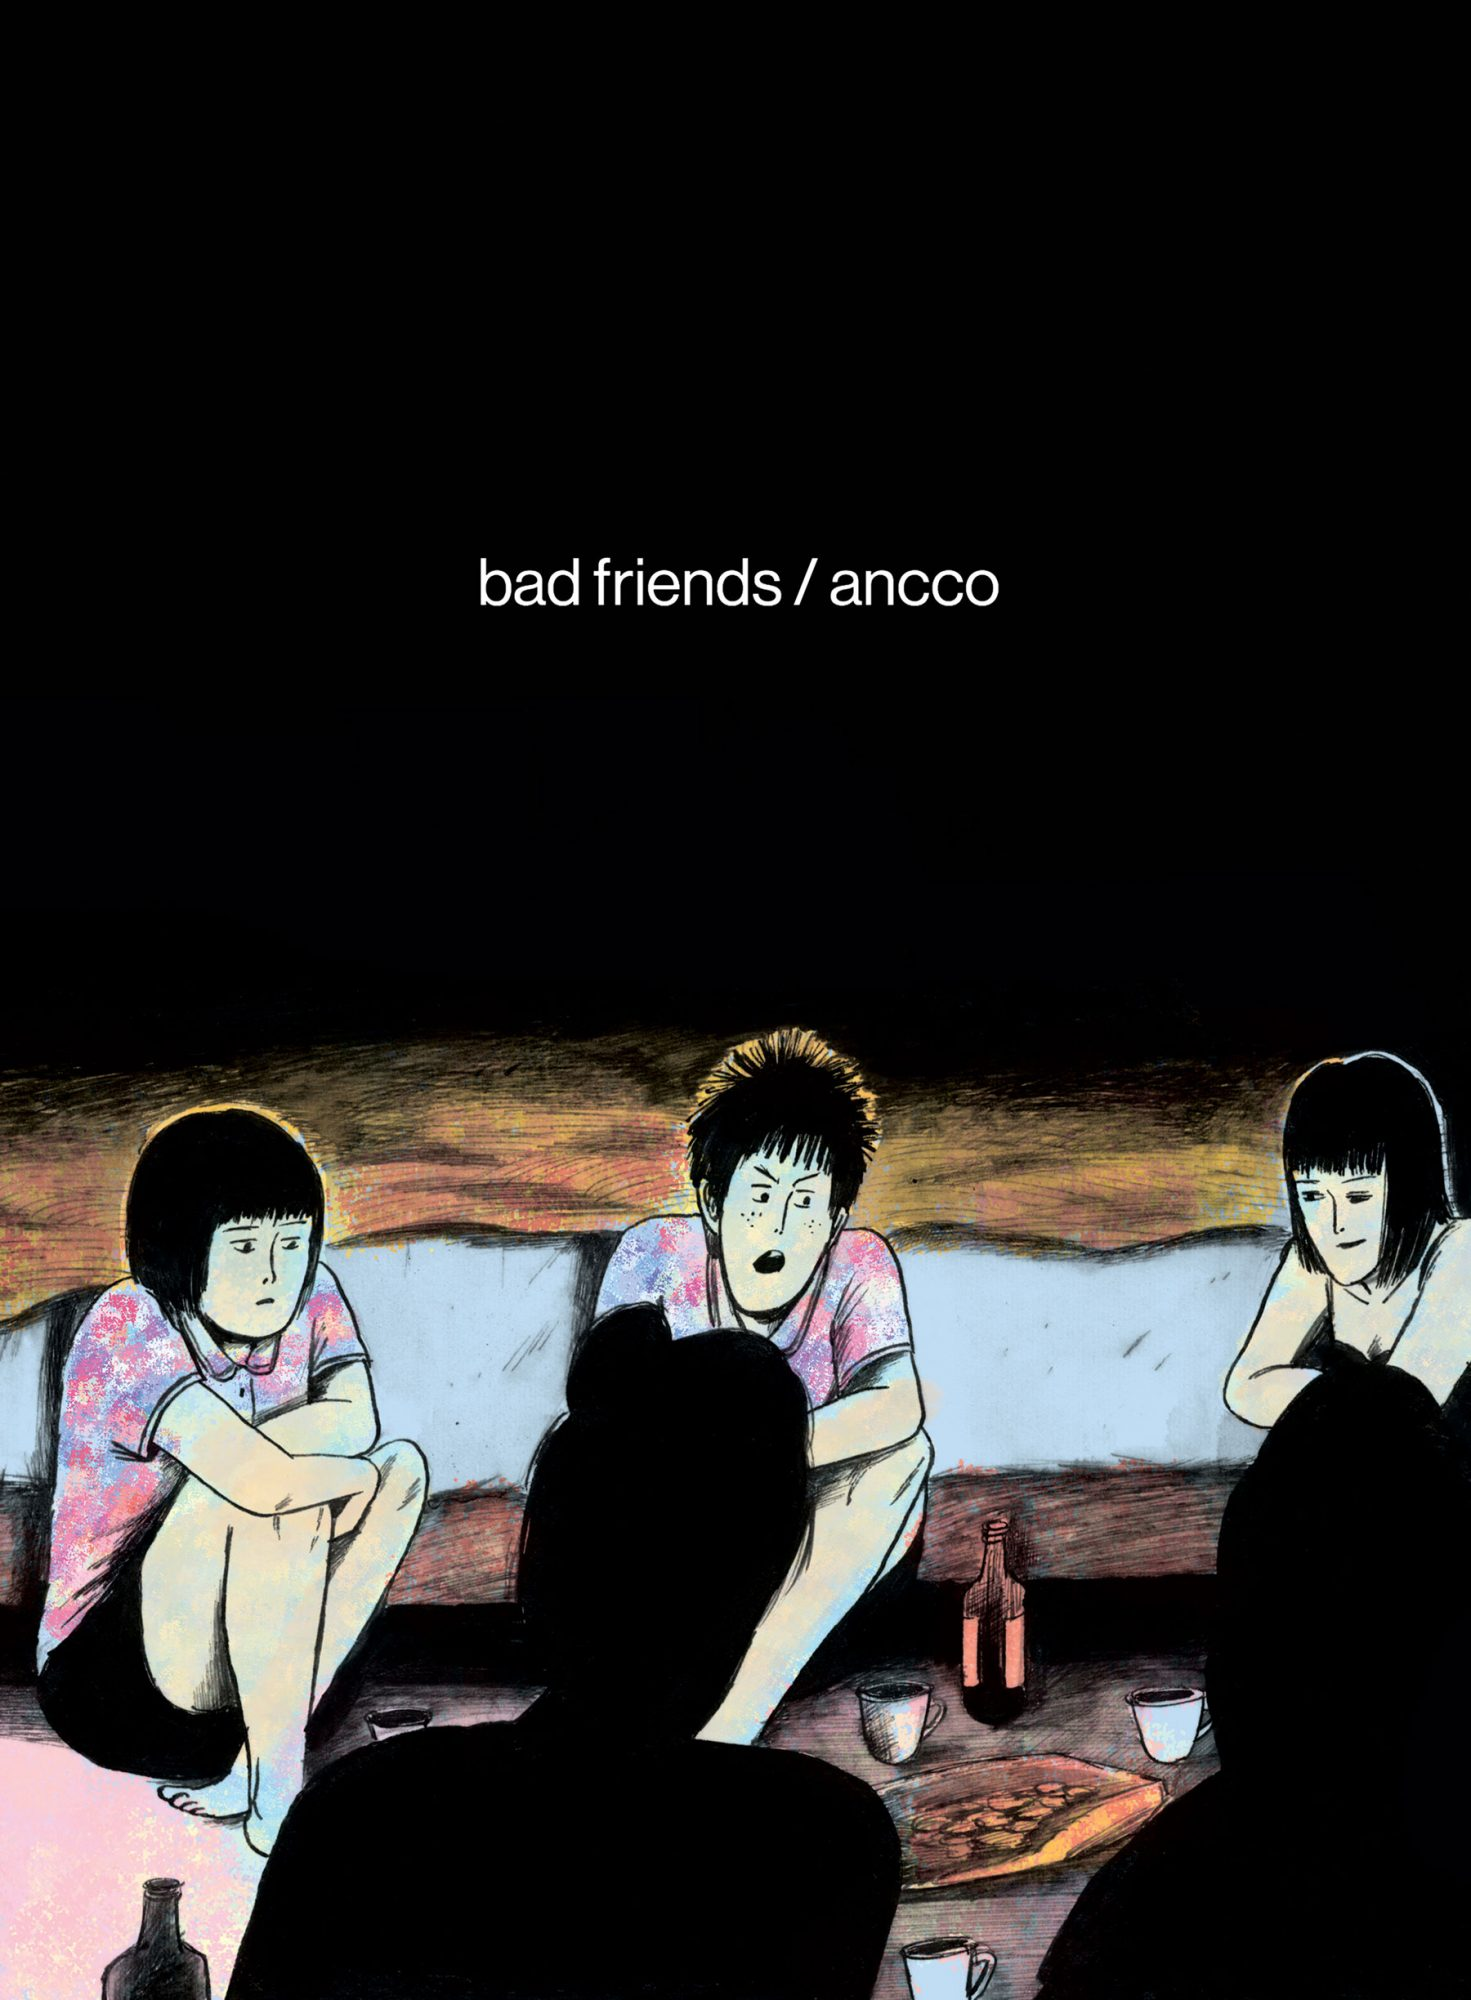 badfriendscover